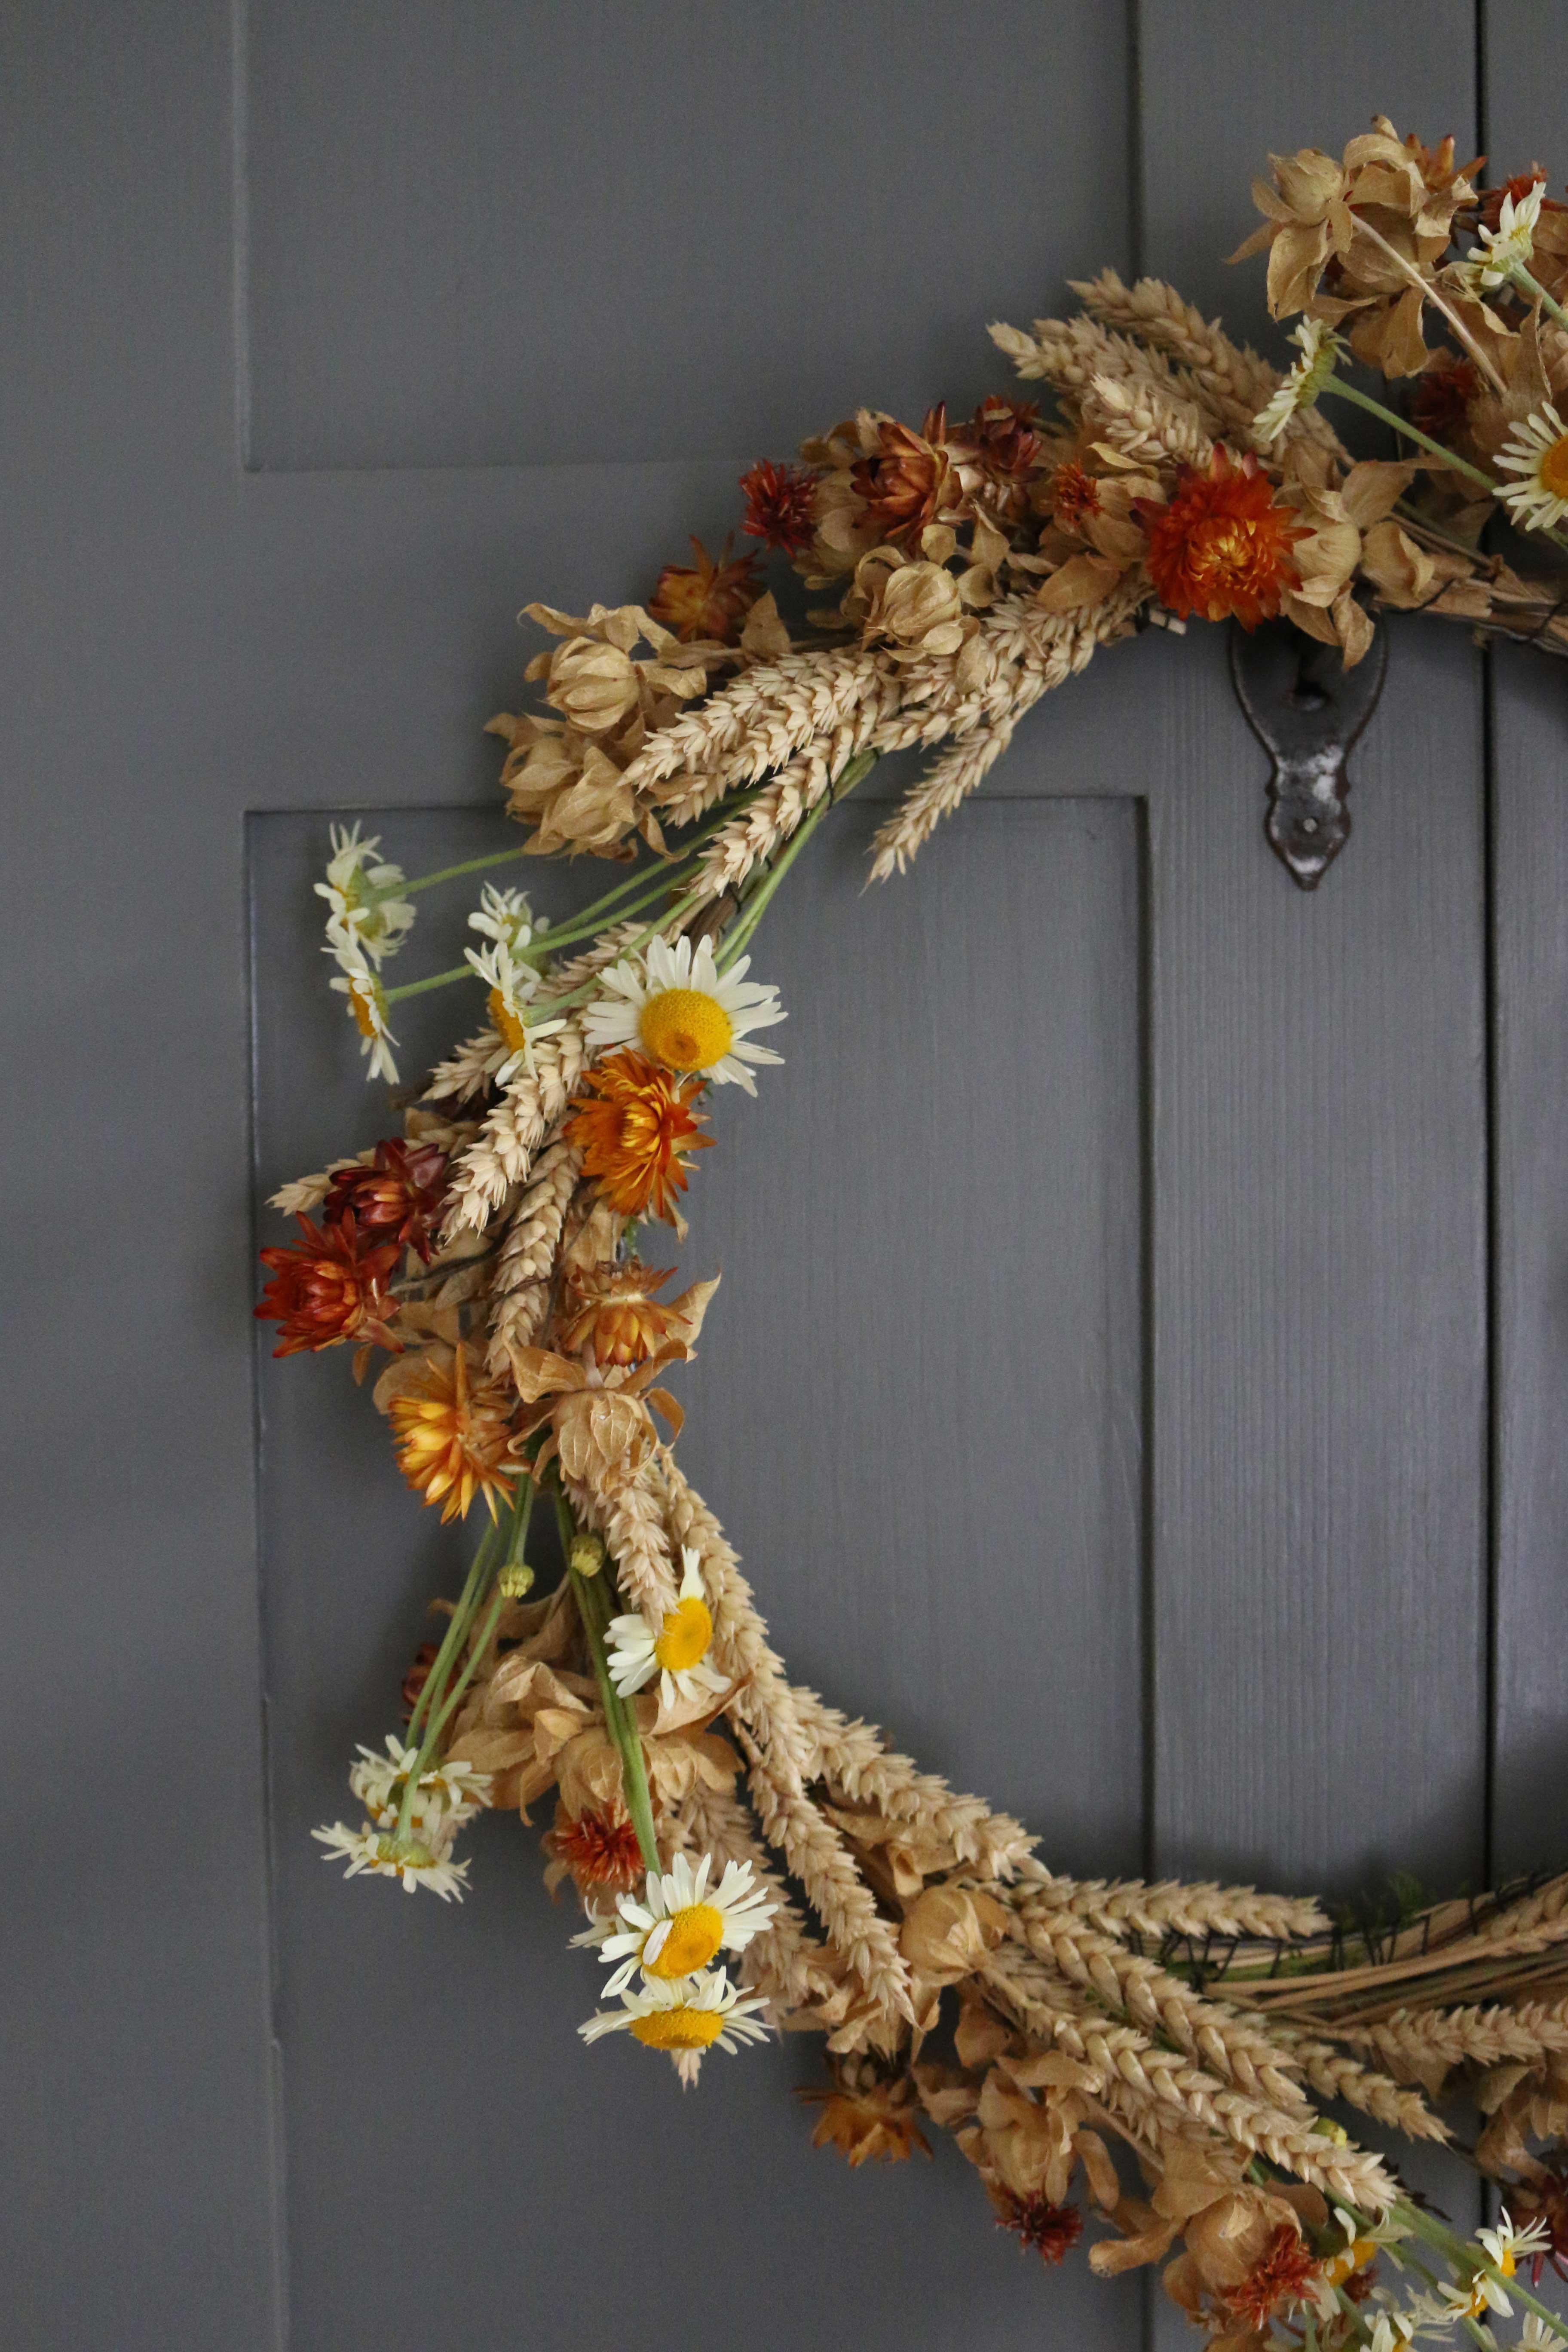 krans met droogbloemen